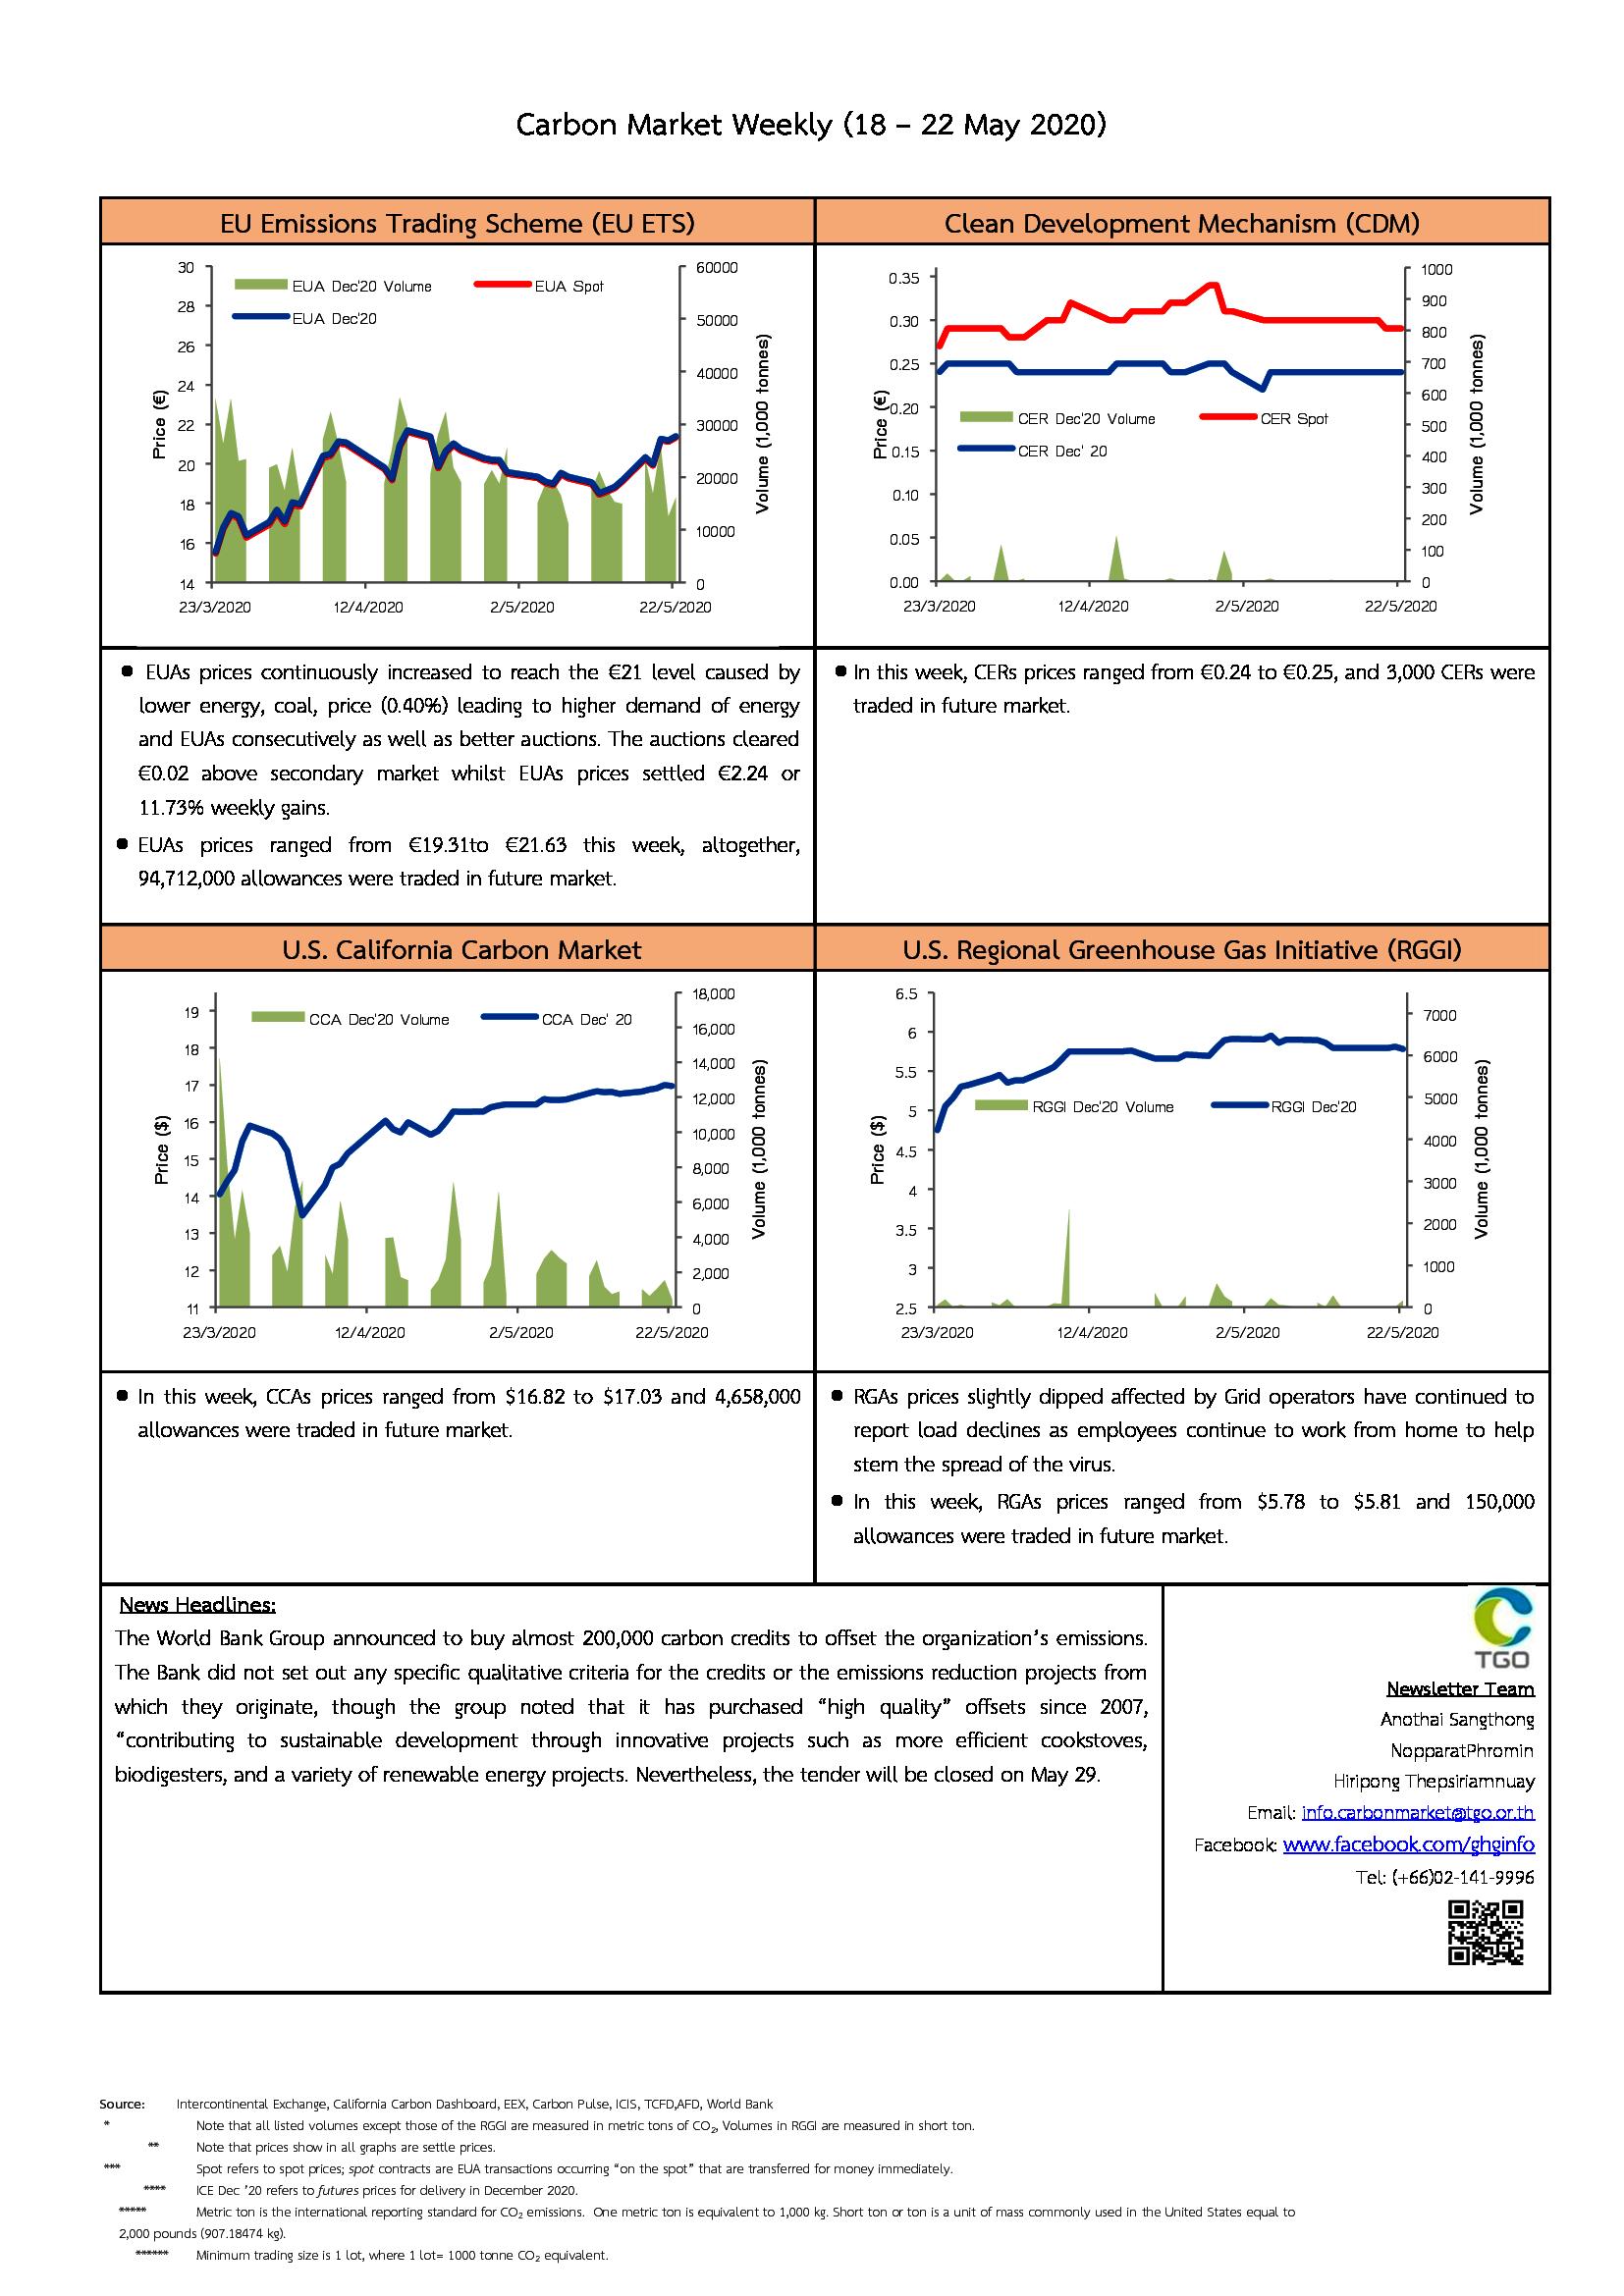 Carbon Market Weekly (18 - 22 May 2020)